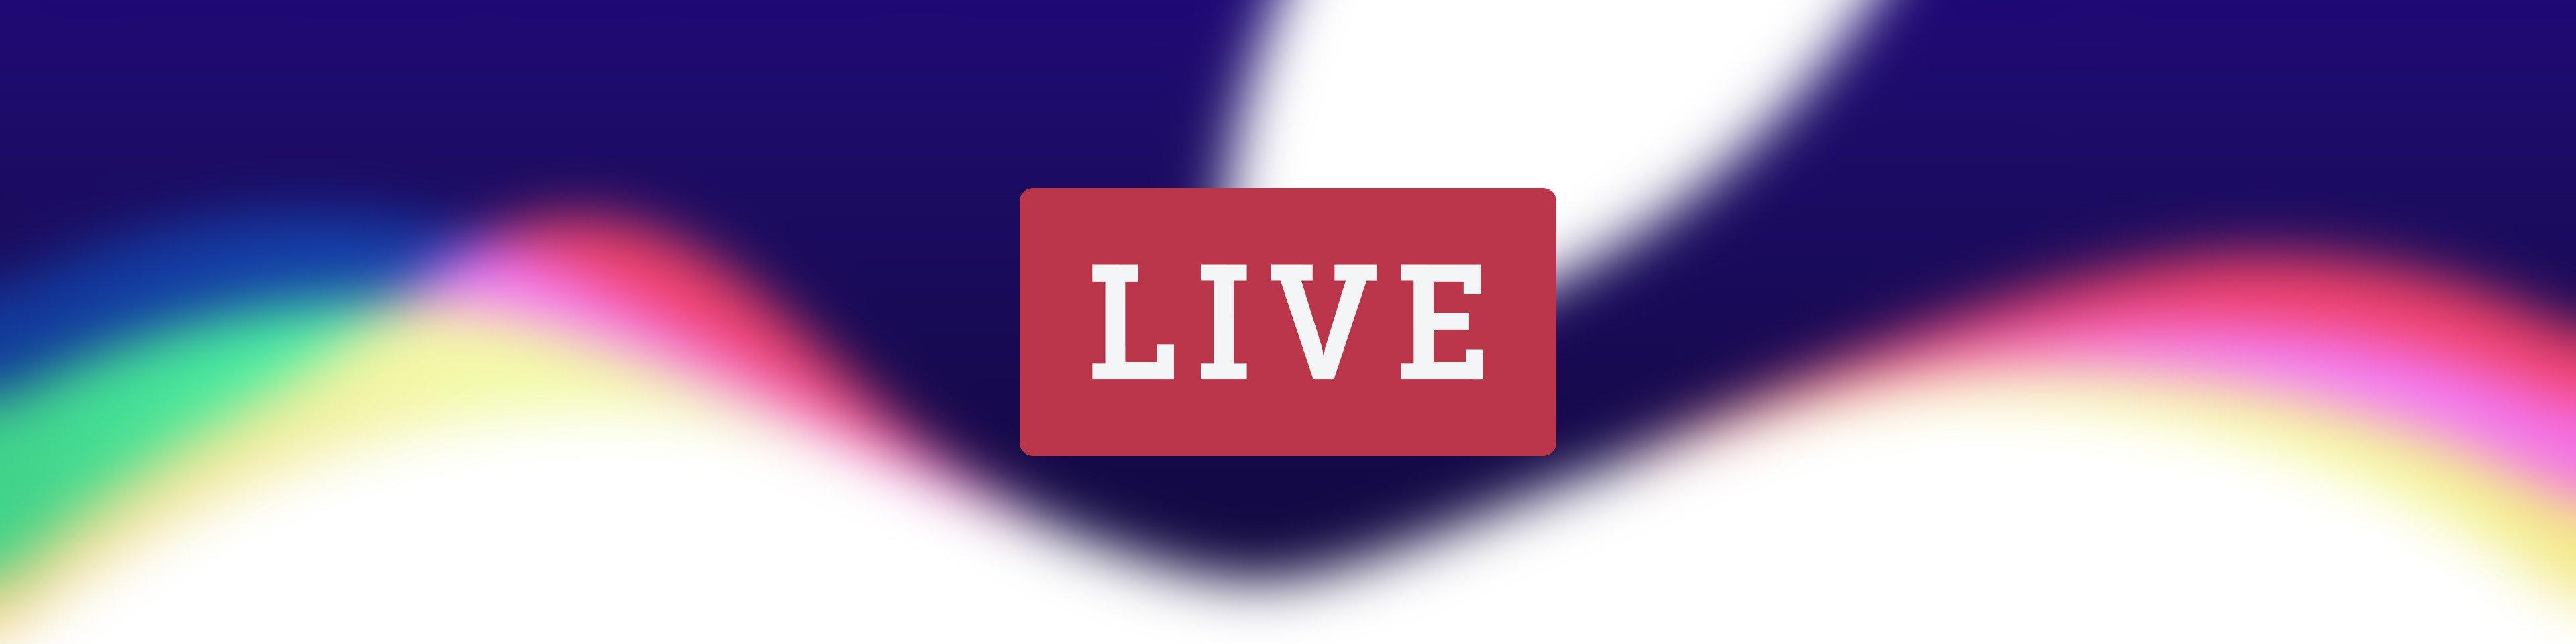 Apple Event September 2015 Live